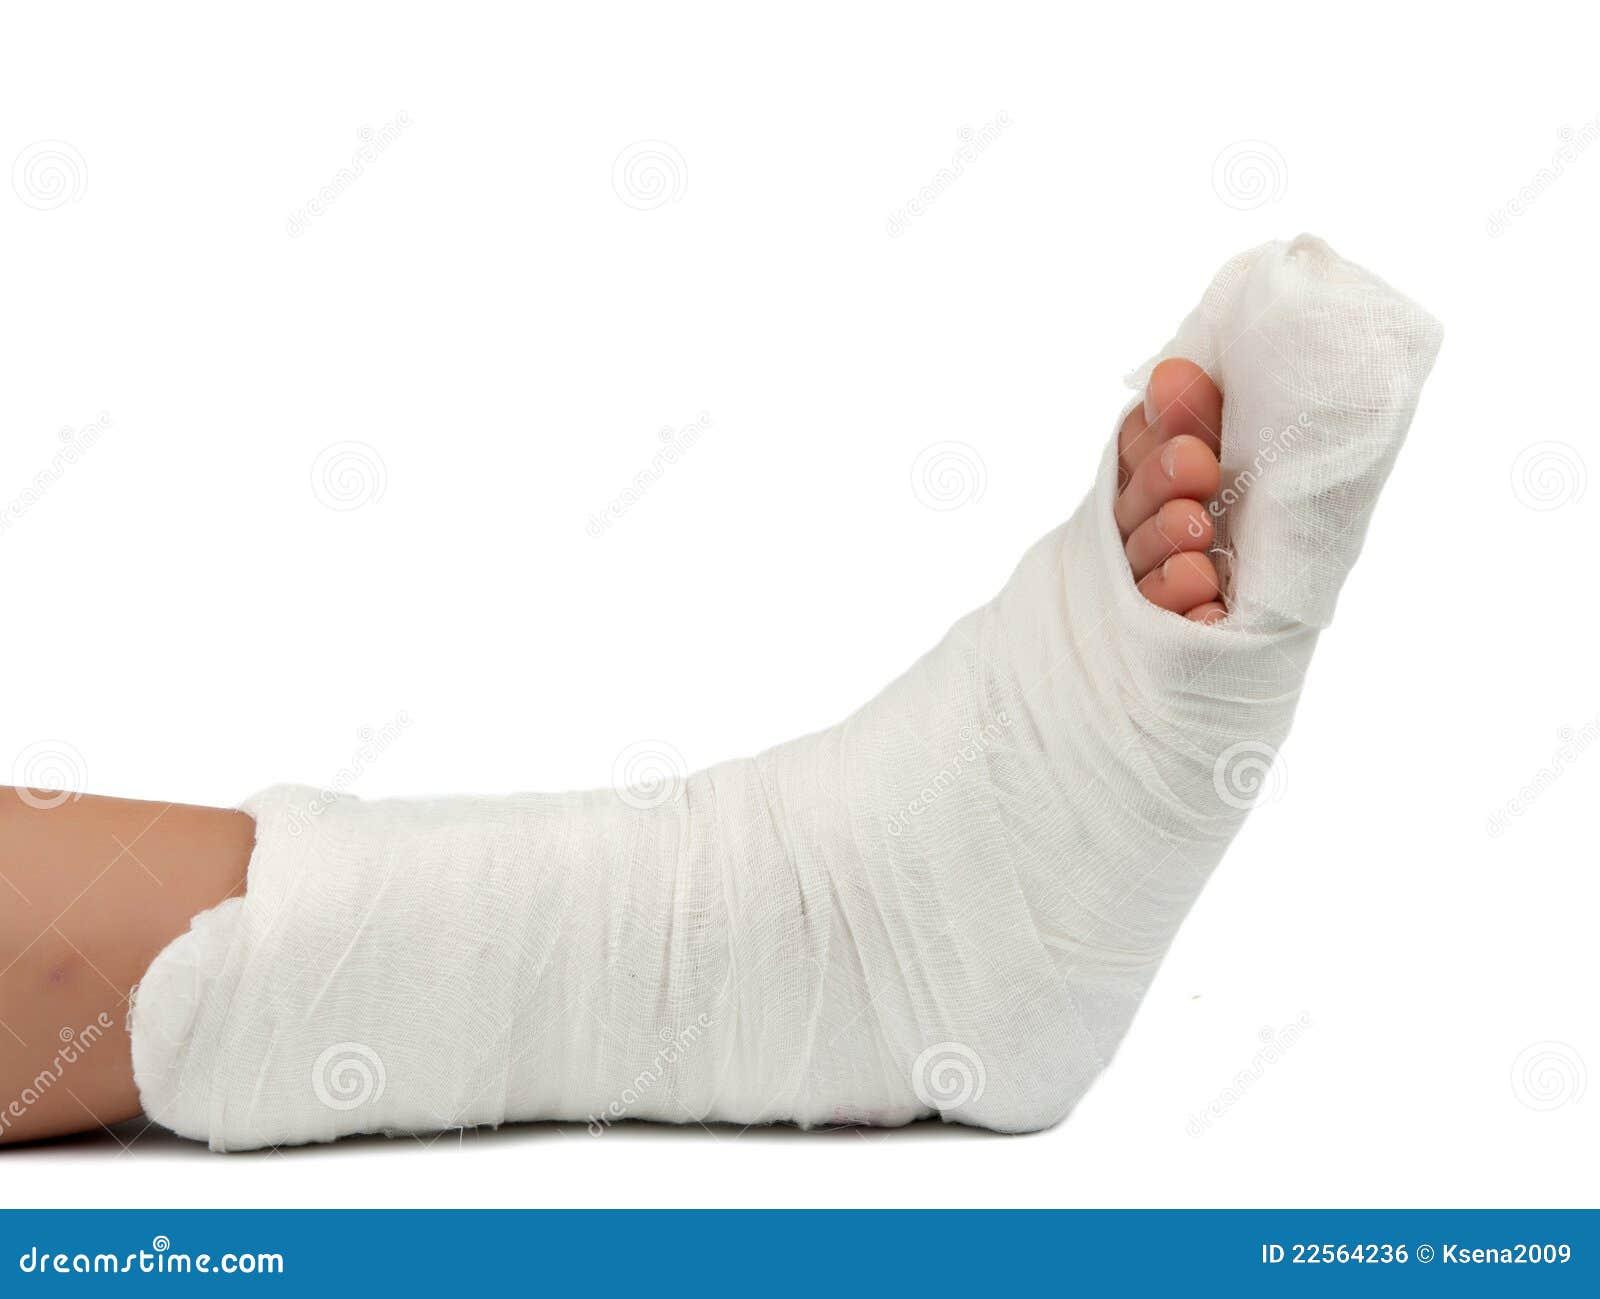 Leg in a plaster cast